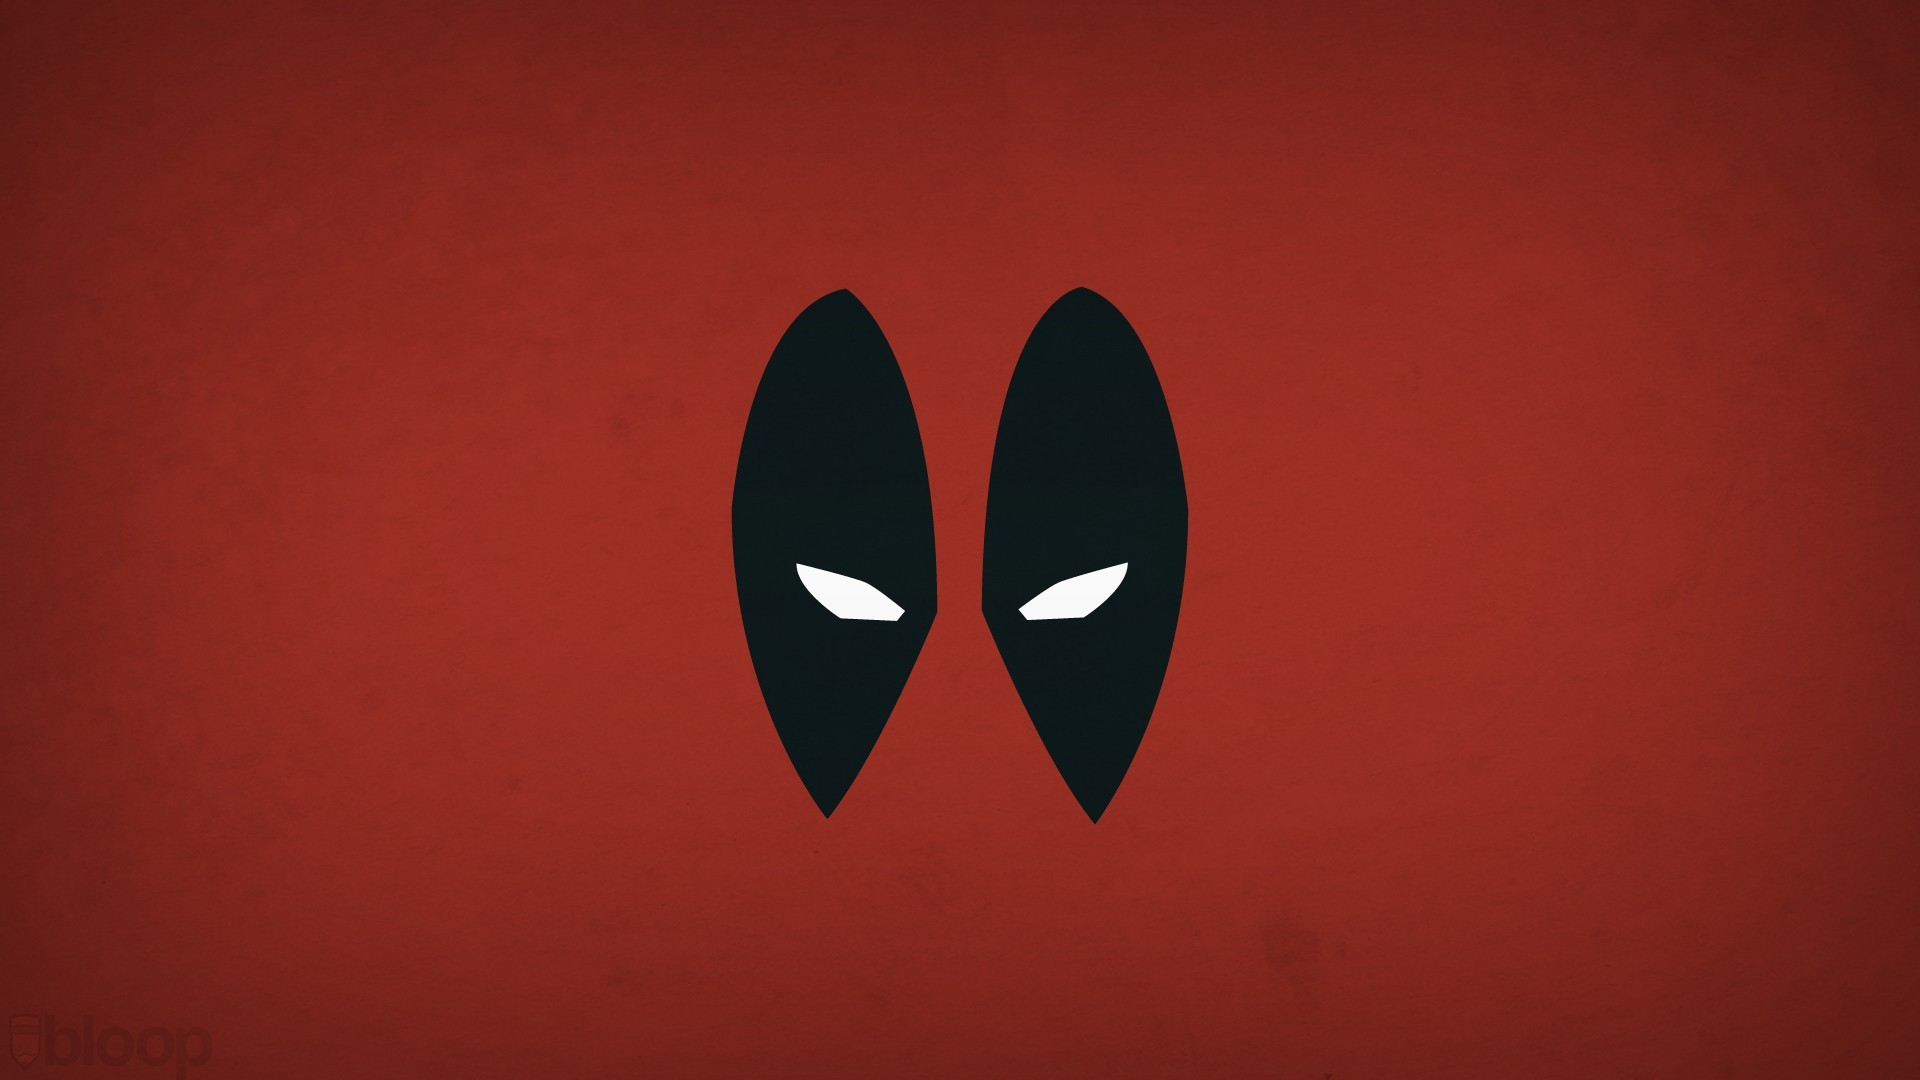 General 1920x1080 minimalism Marvel Comics hero Deadpool Blo0p simple background red background antiheroes